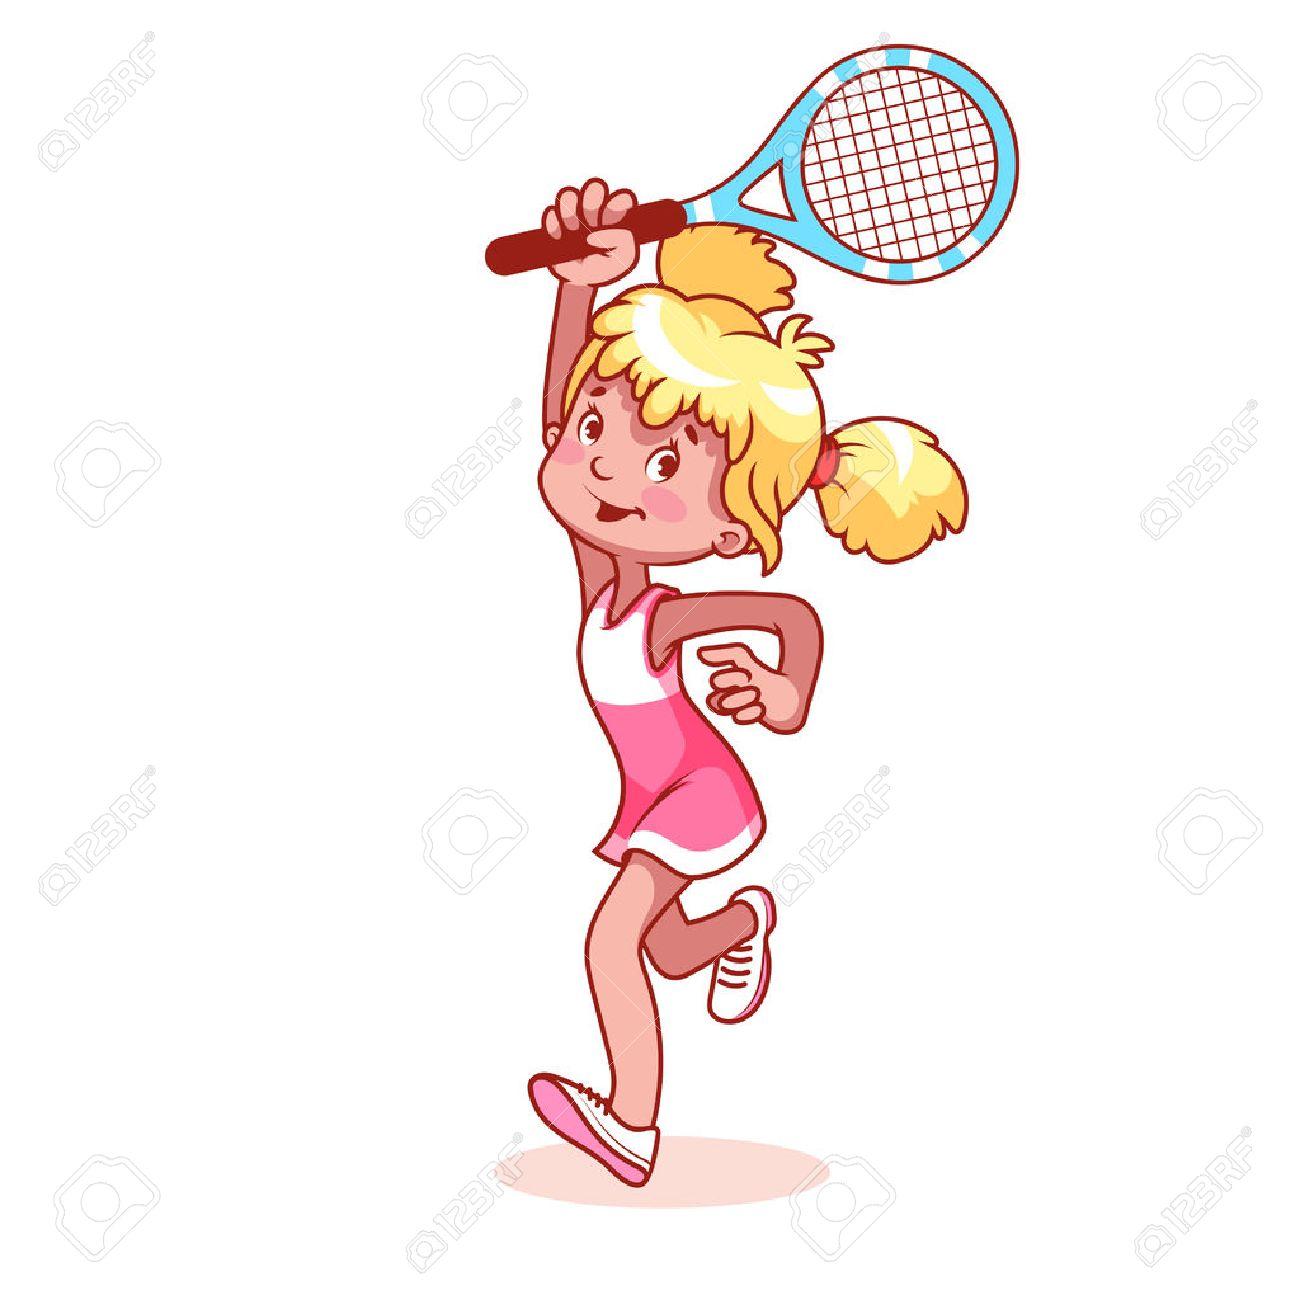 1300x1300 Cartoon Girl Playing Tennis. Clip Art Illustration On A White